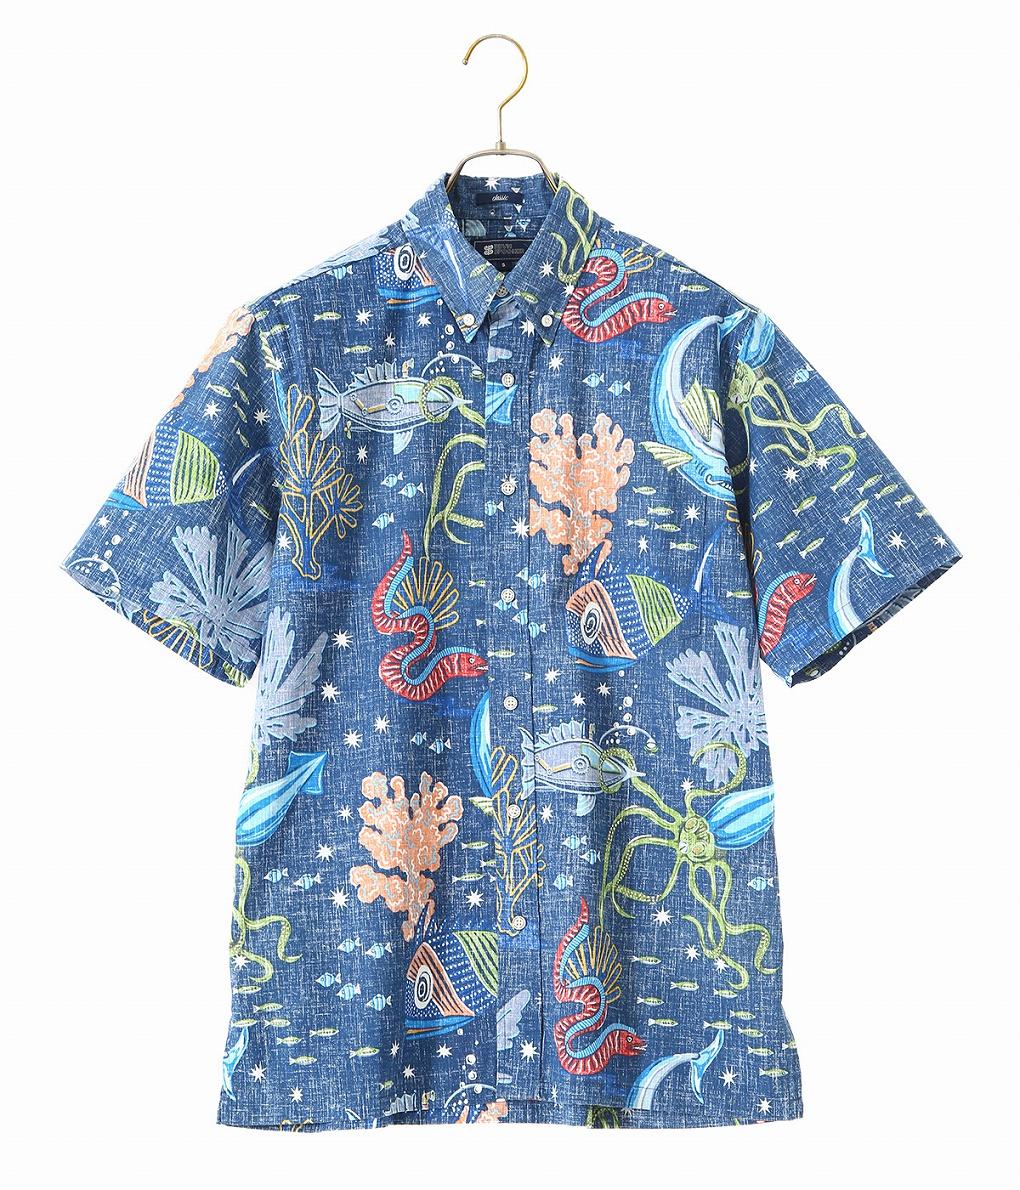 REYN SPOONER / レインスプーナー : Deep Sea Jive : レインスプーナー ボタンダウン 半袖 シャツ 柄シャツ アロハシャツ ハワイアンシャツ ハワイ メンズ : 0101-11-001【AST】